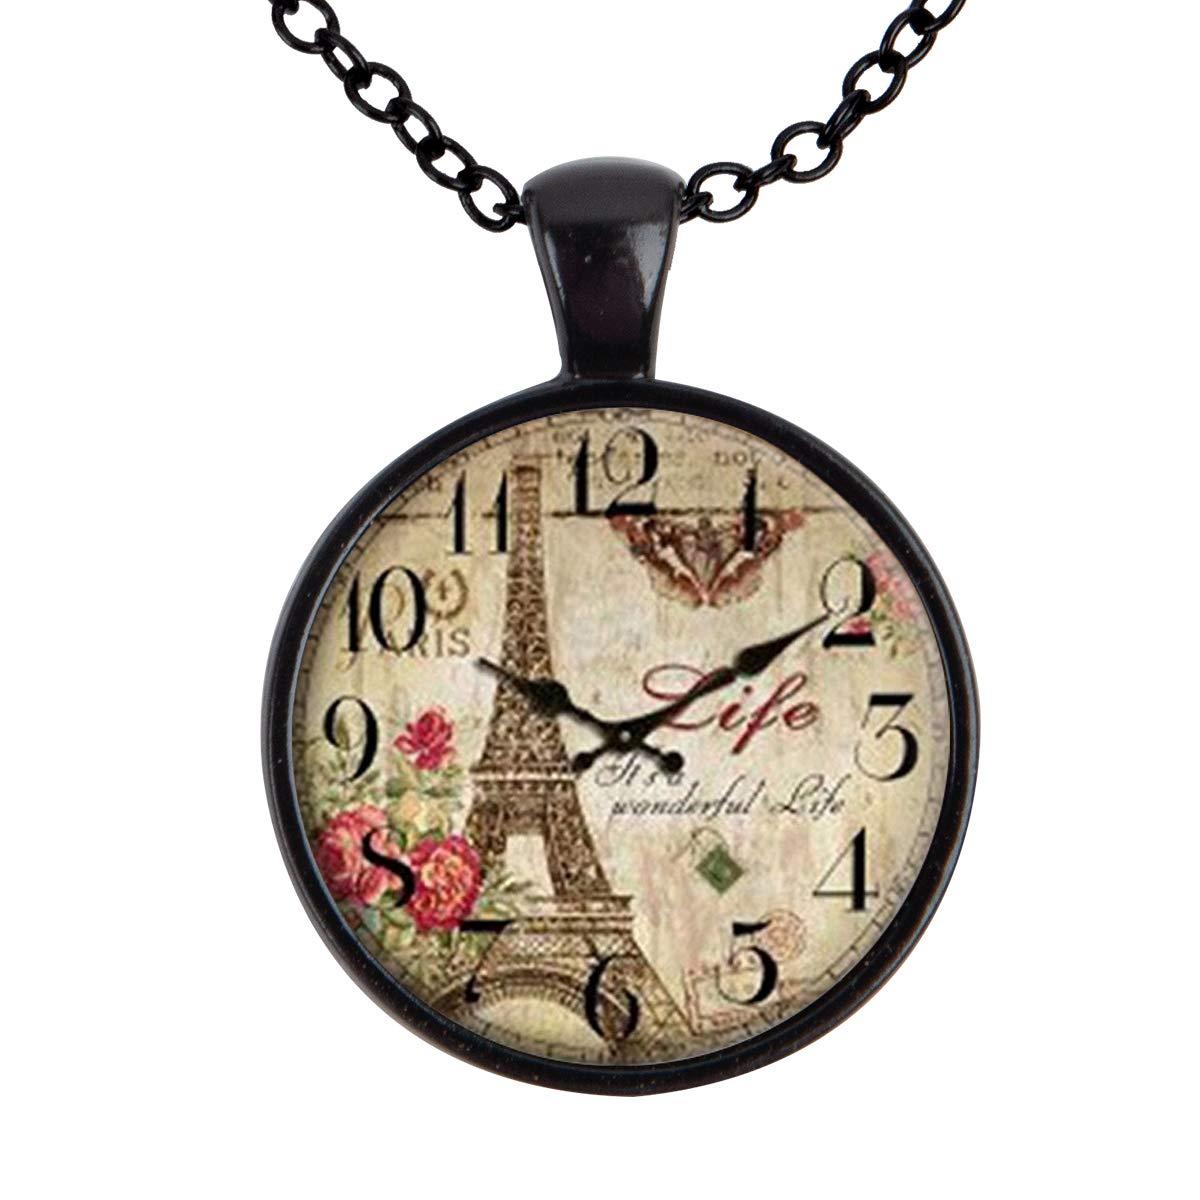 Lightrain Retro Clock Eiffel Tower Pendant Necklace Vintage Bronze Chain Statement Necklace Handmade Jewelry Gifts